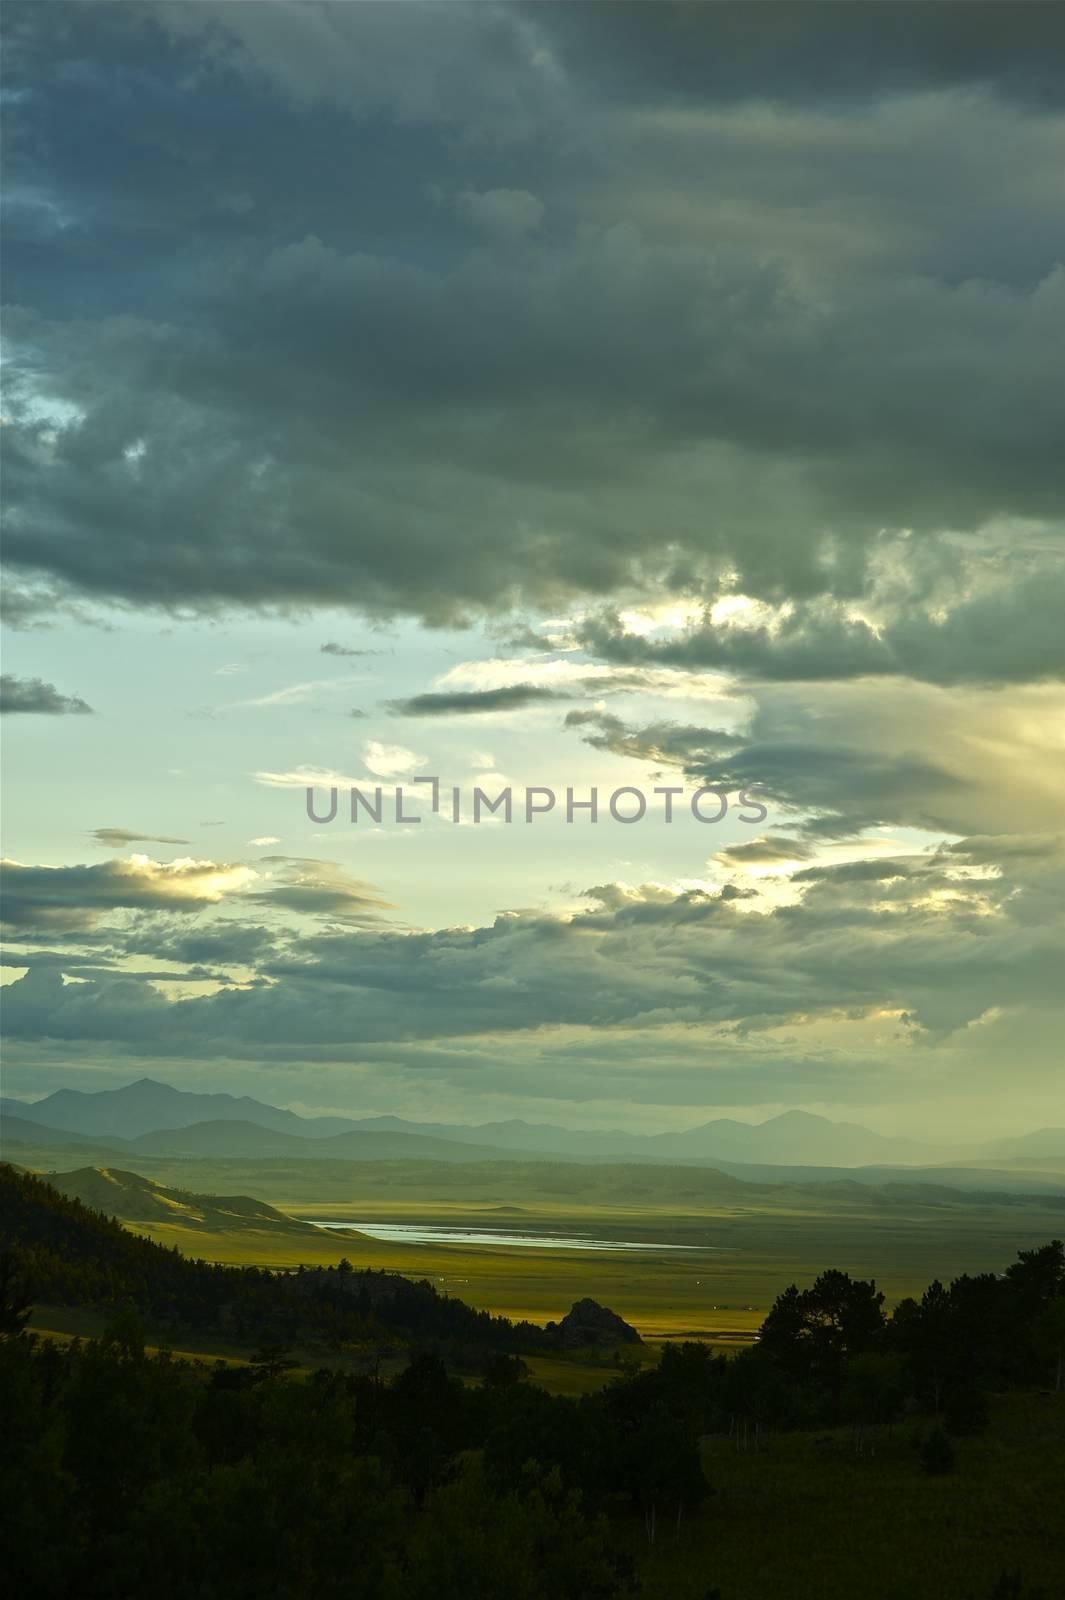 Summer Valley. Elevan Miles State Park Valley, Colorado. Summer Stormy Day.